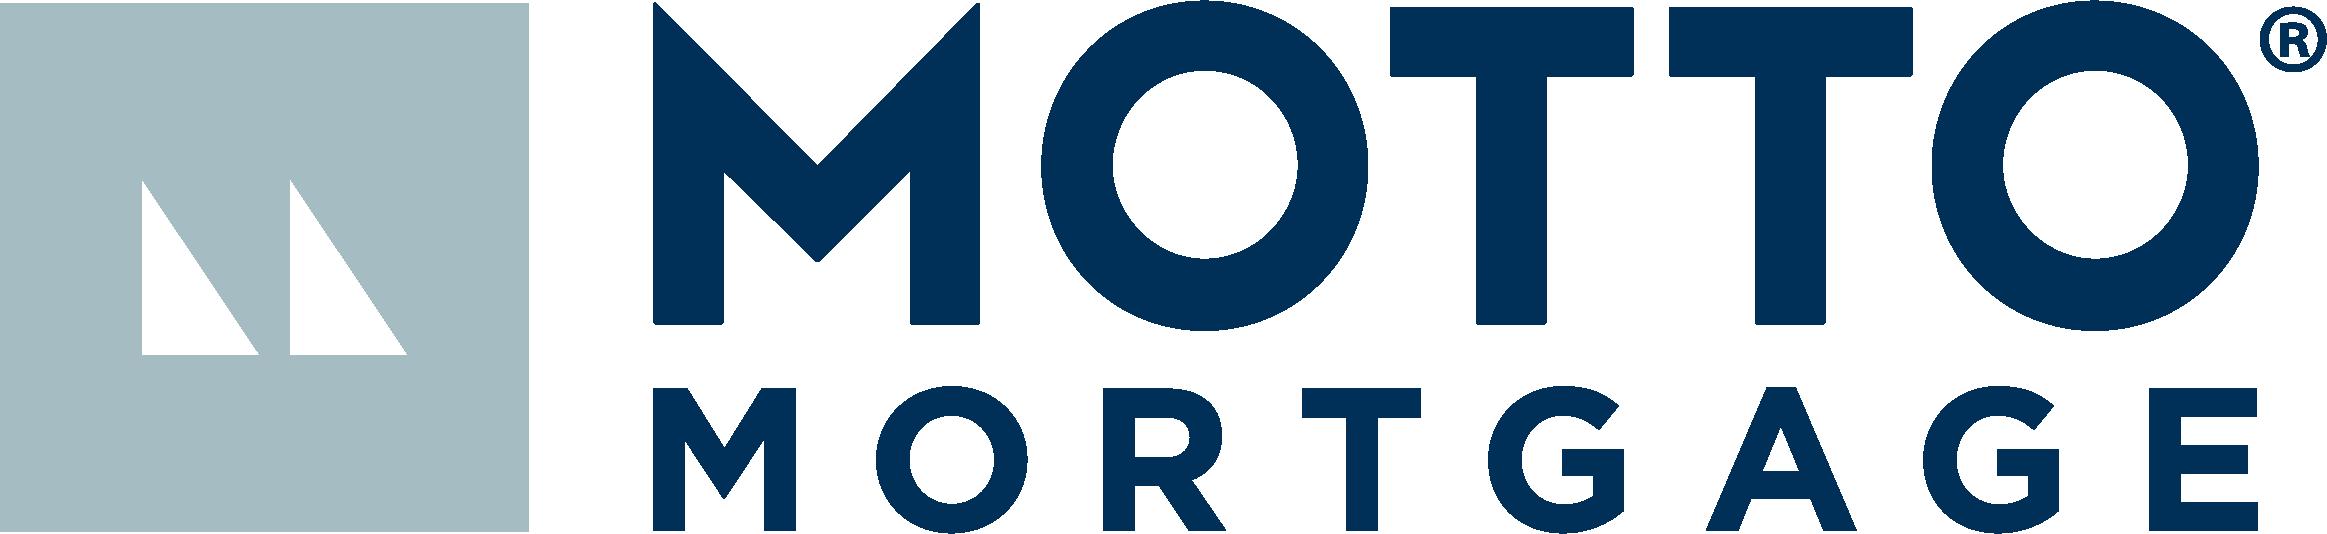 MottoMortgage_PRIMARY_SMALL_2COLOR-1_RGB